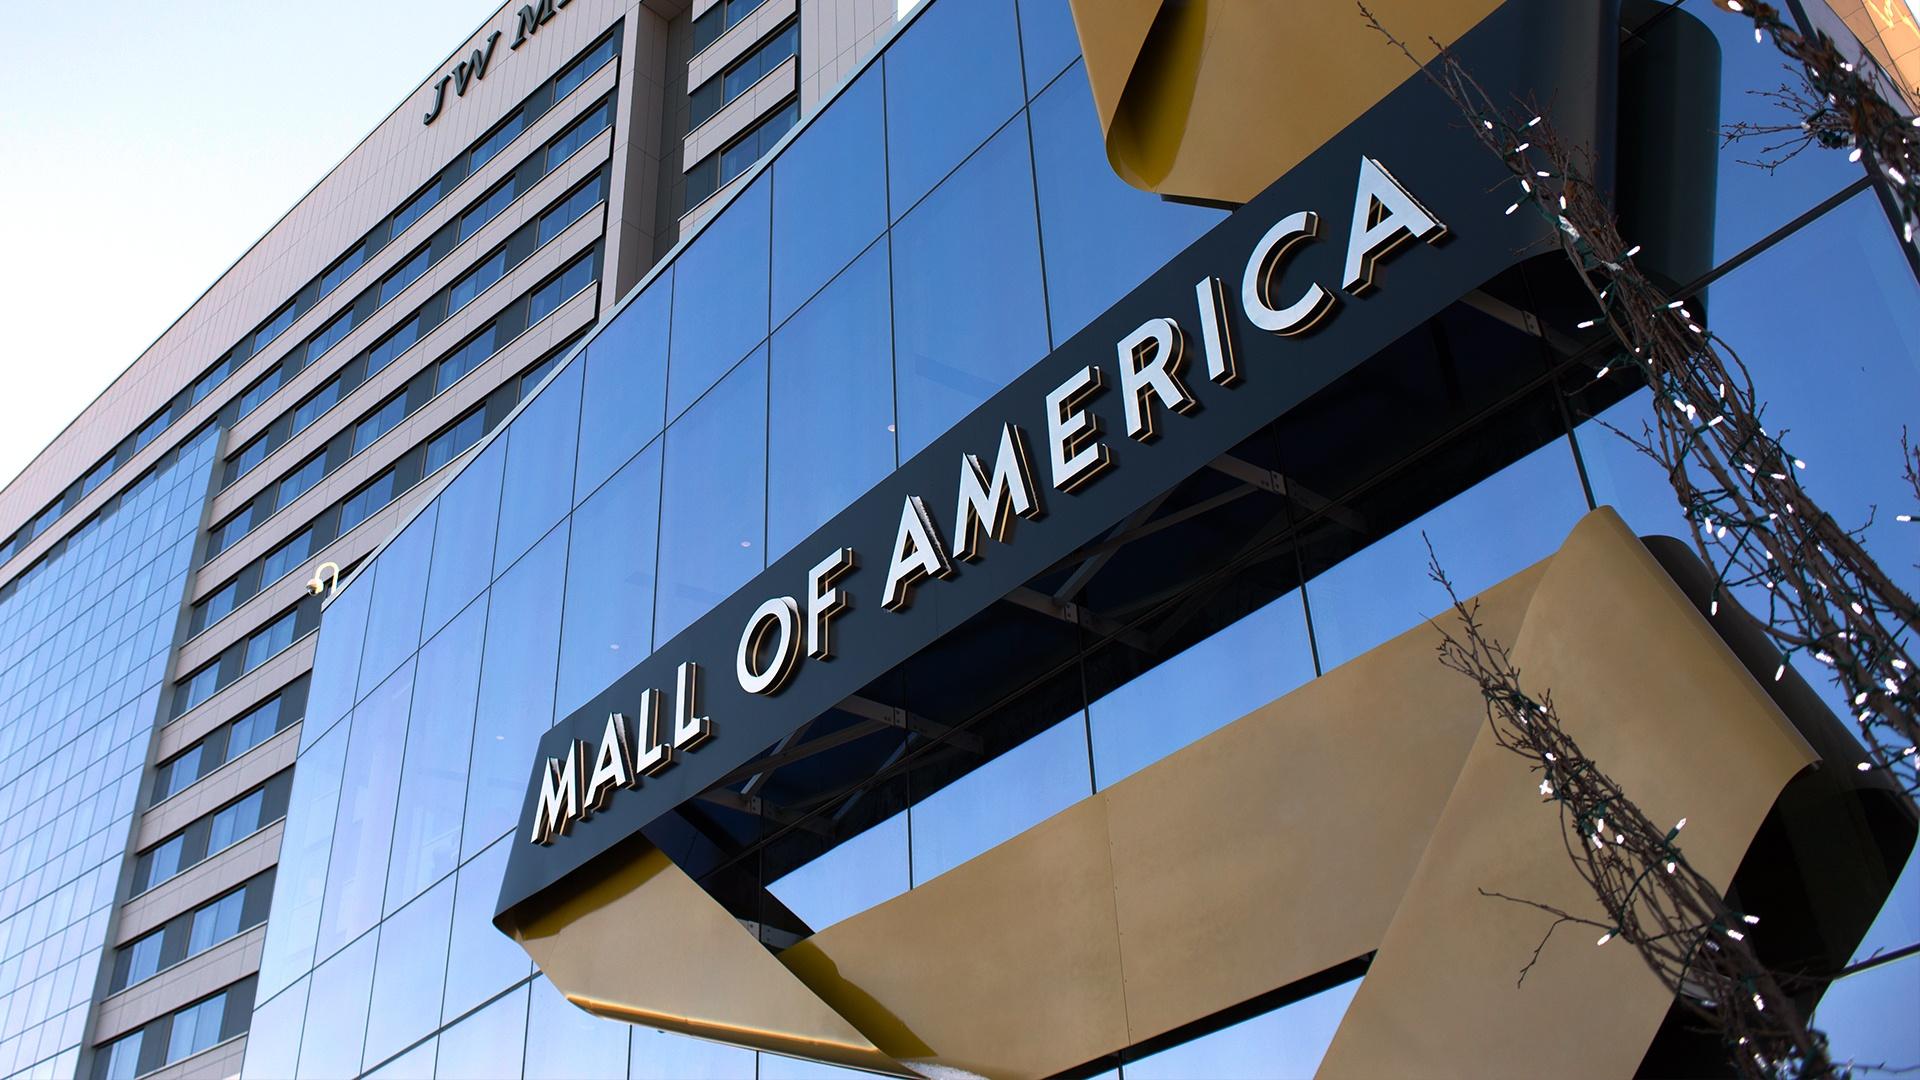 Tolon fashion mall directorio Directorio - top shopping centers